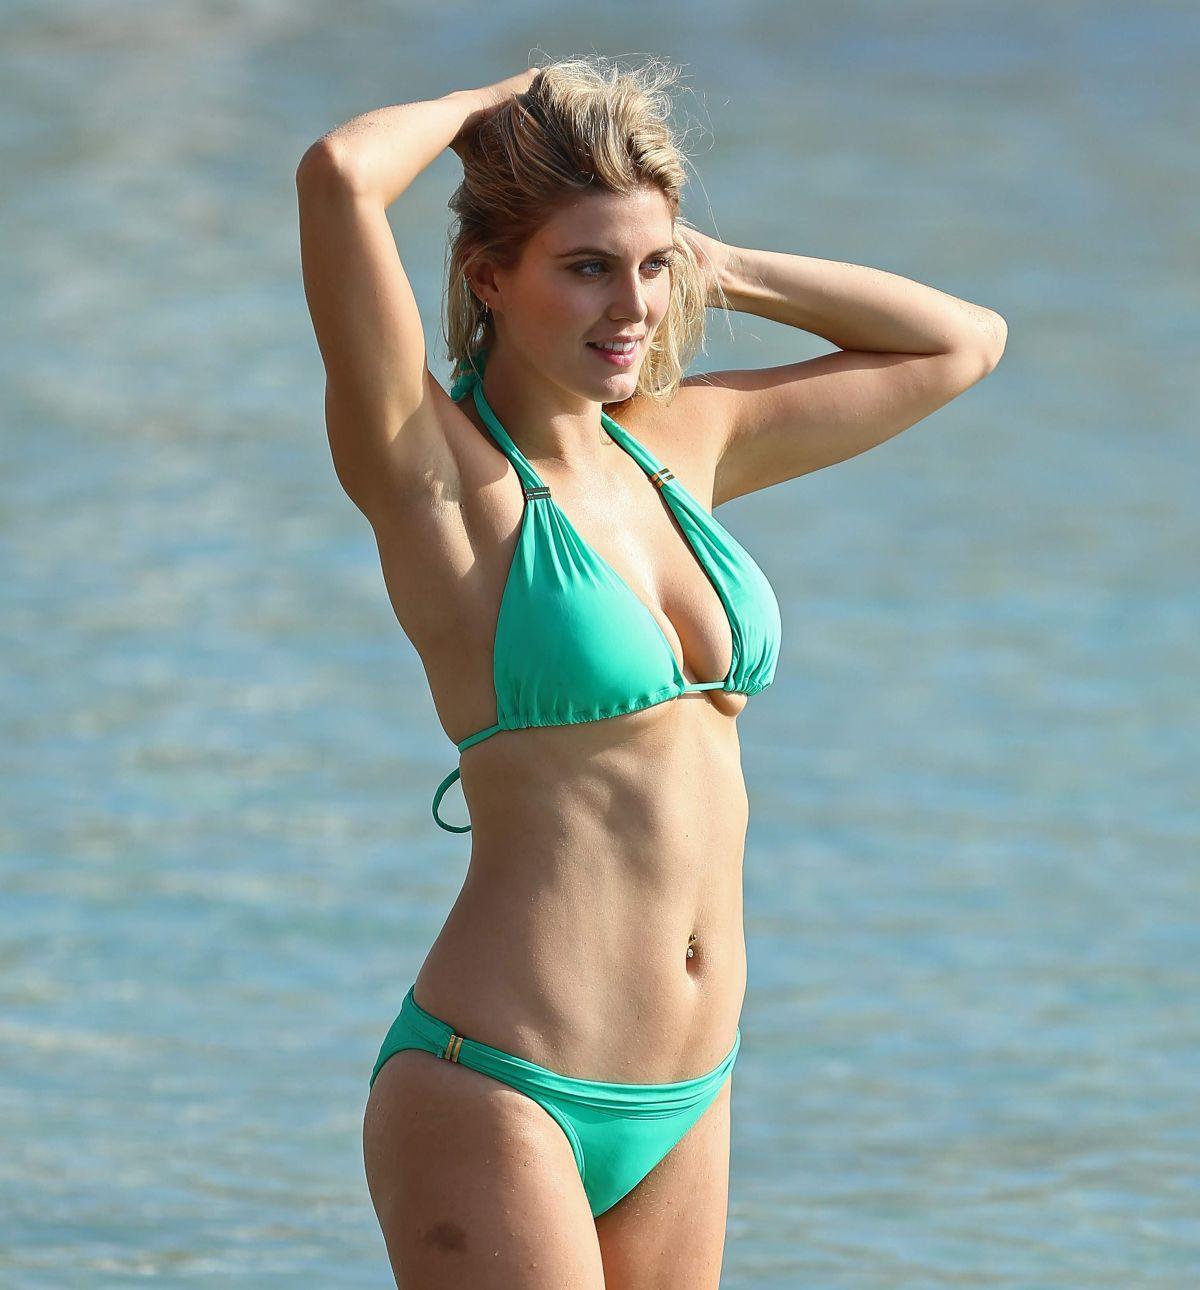 Bikini Vivien James nudes (47 photos), Topless, Is a cute, Selfie, braless 2015